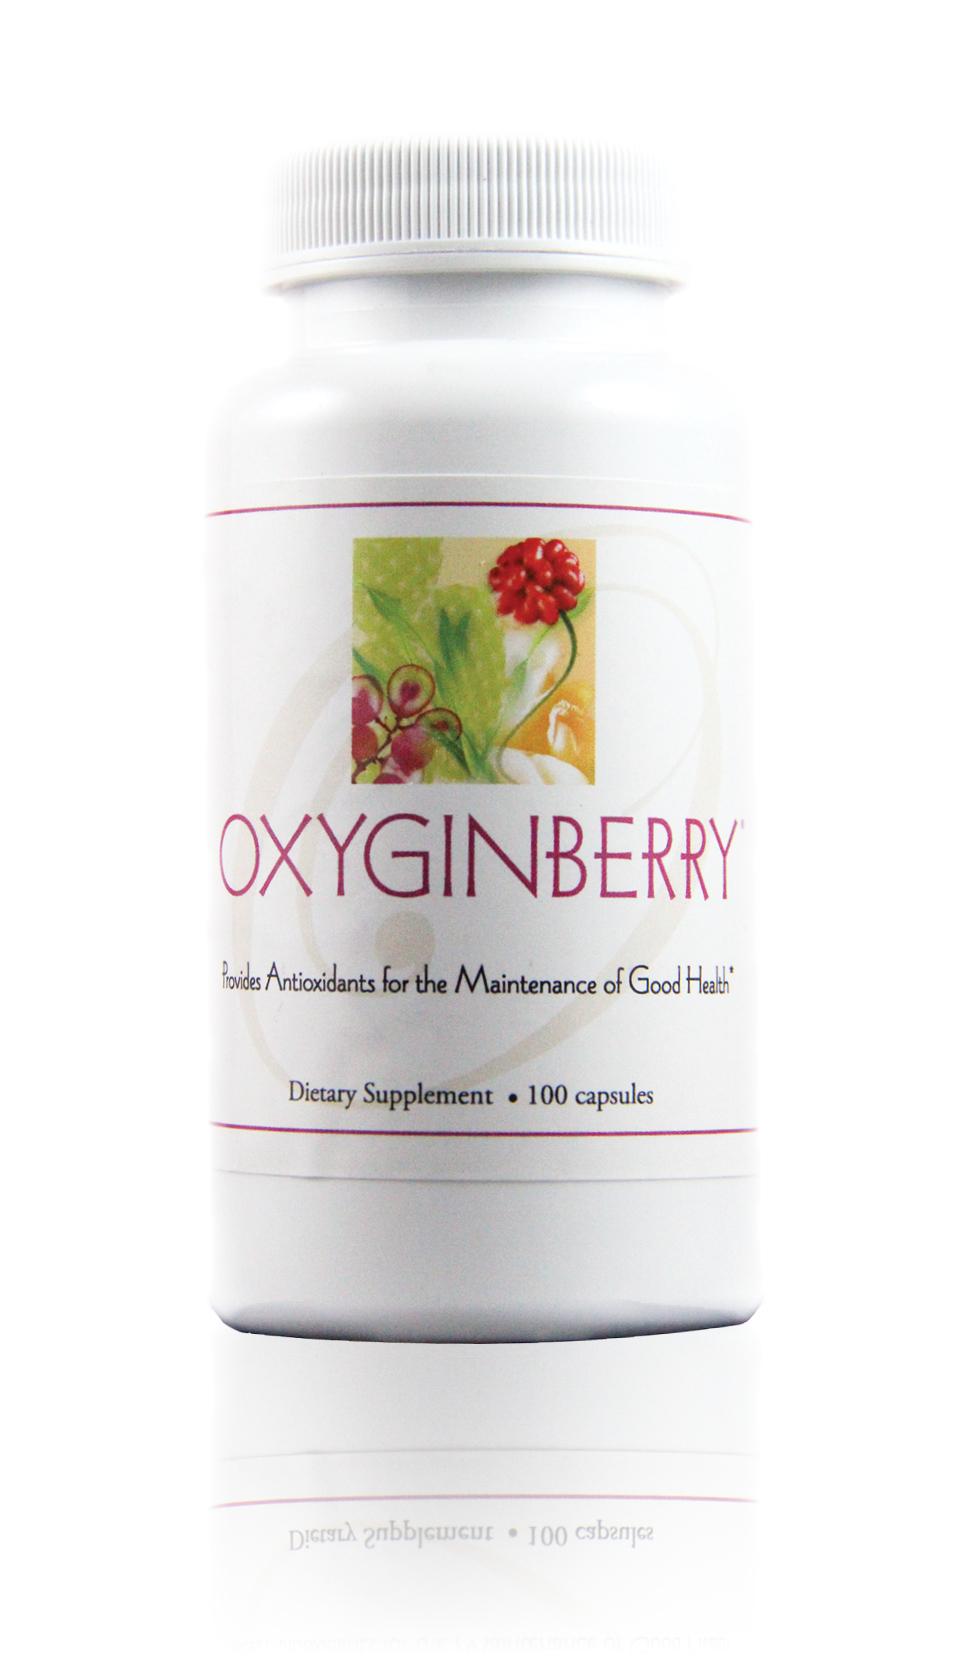 Oxigynberry.jpg